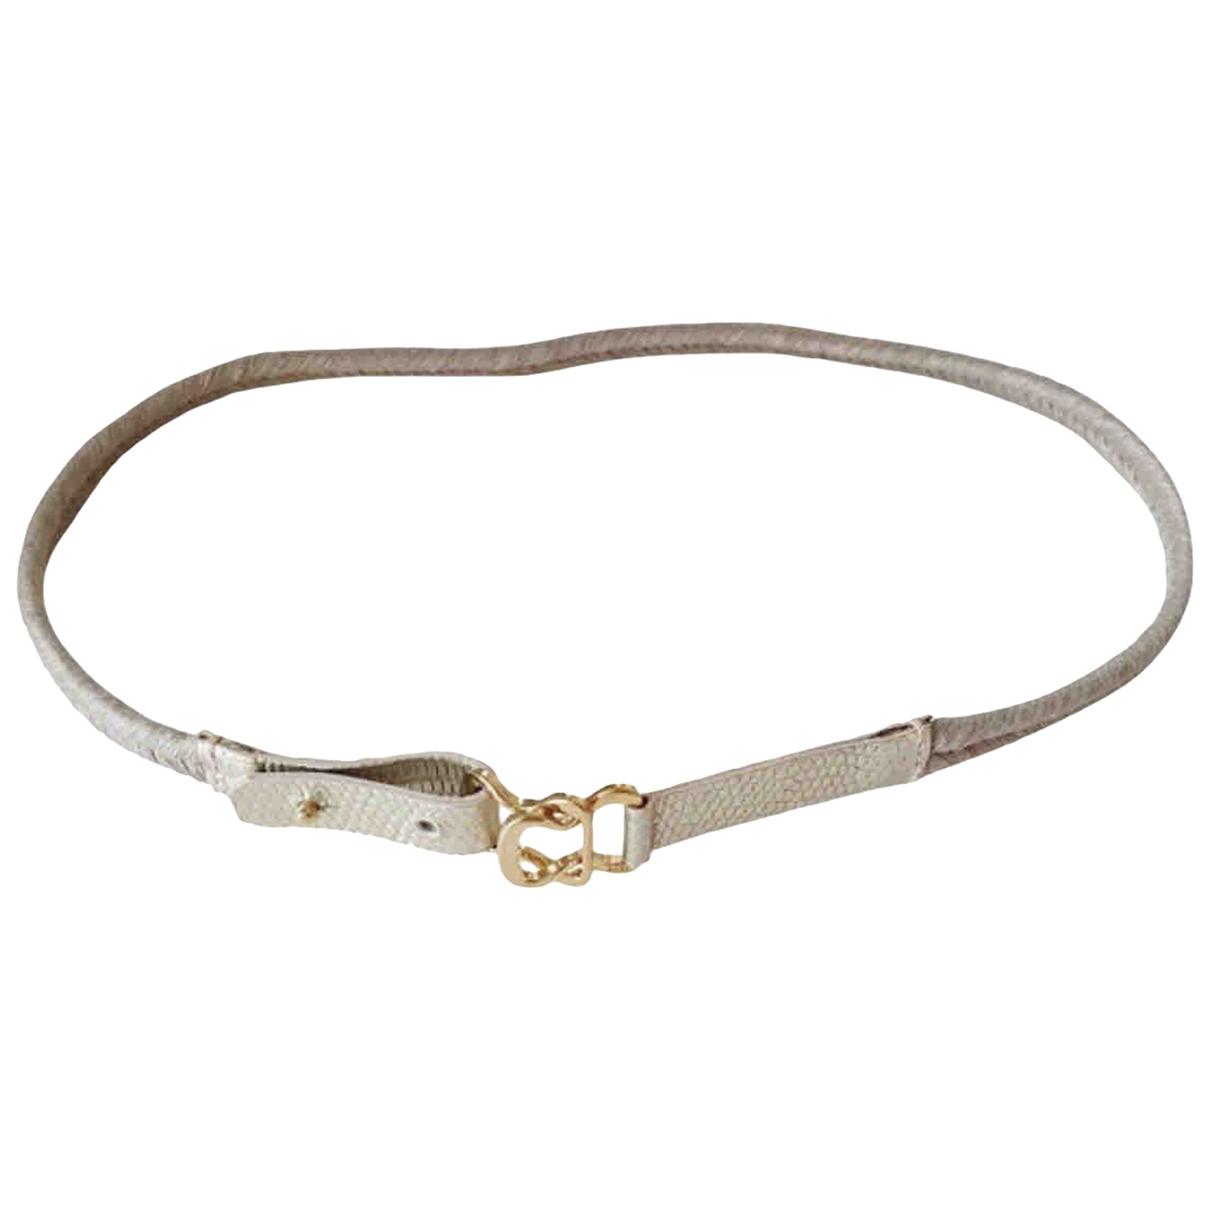 Max Mara \N Gold Leather belt for Women XS International